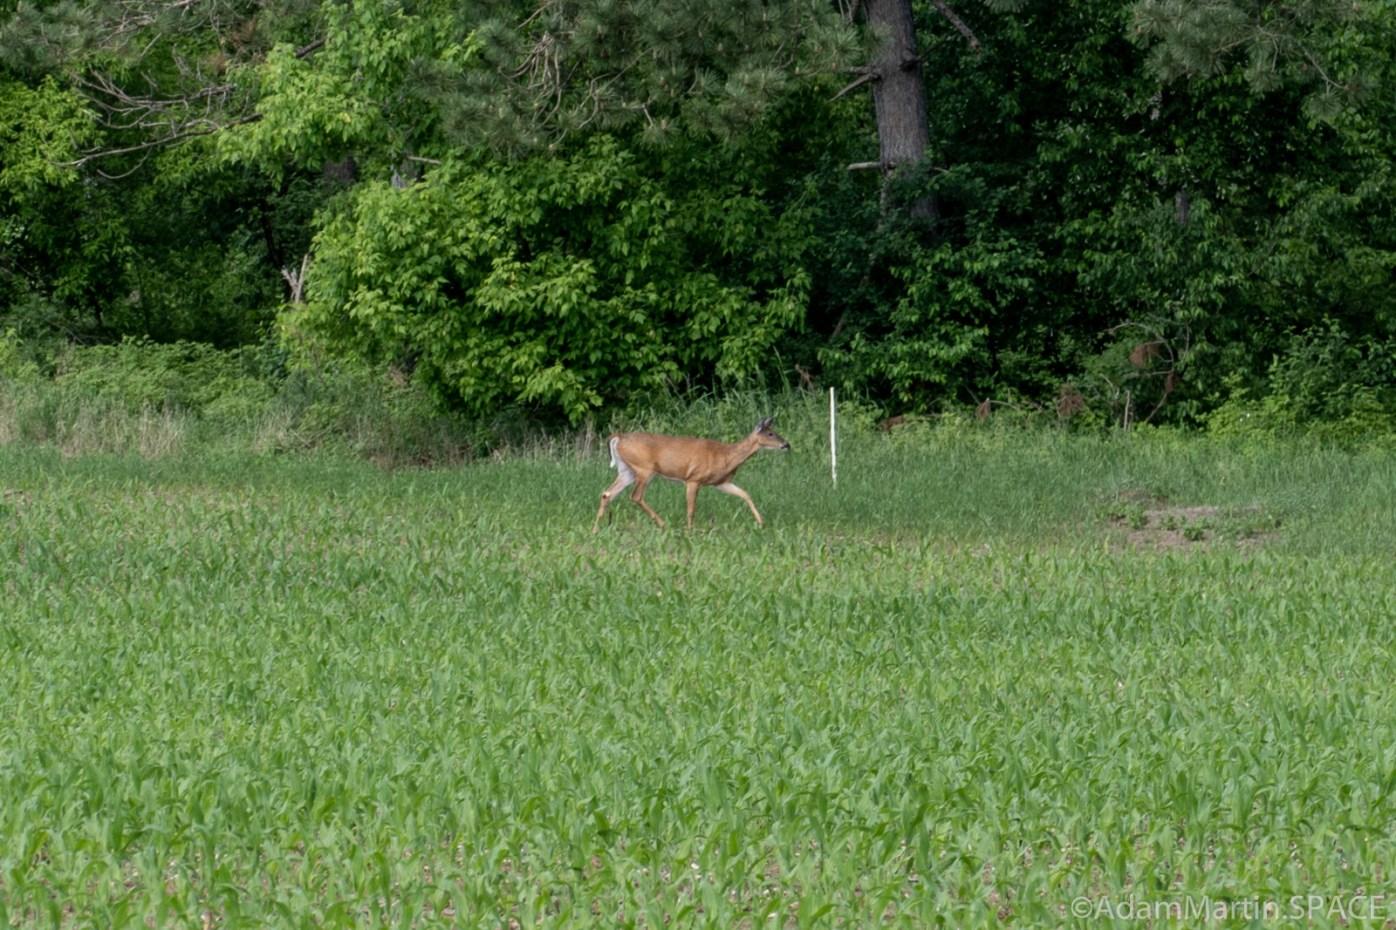 Little Bull Falls (Shawano) - Deer on the private farmland adjacent to public area